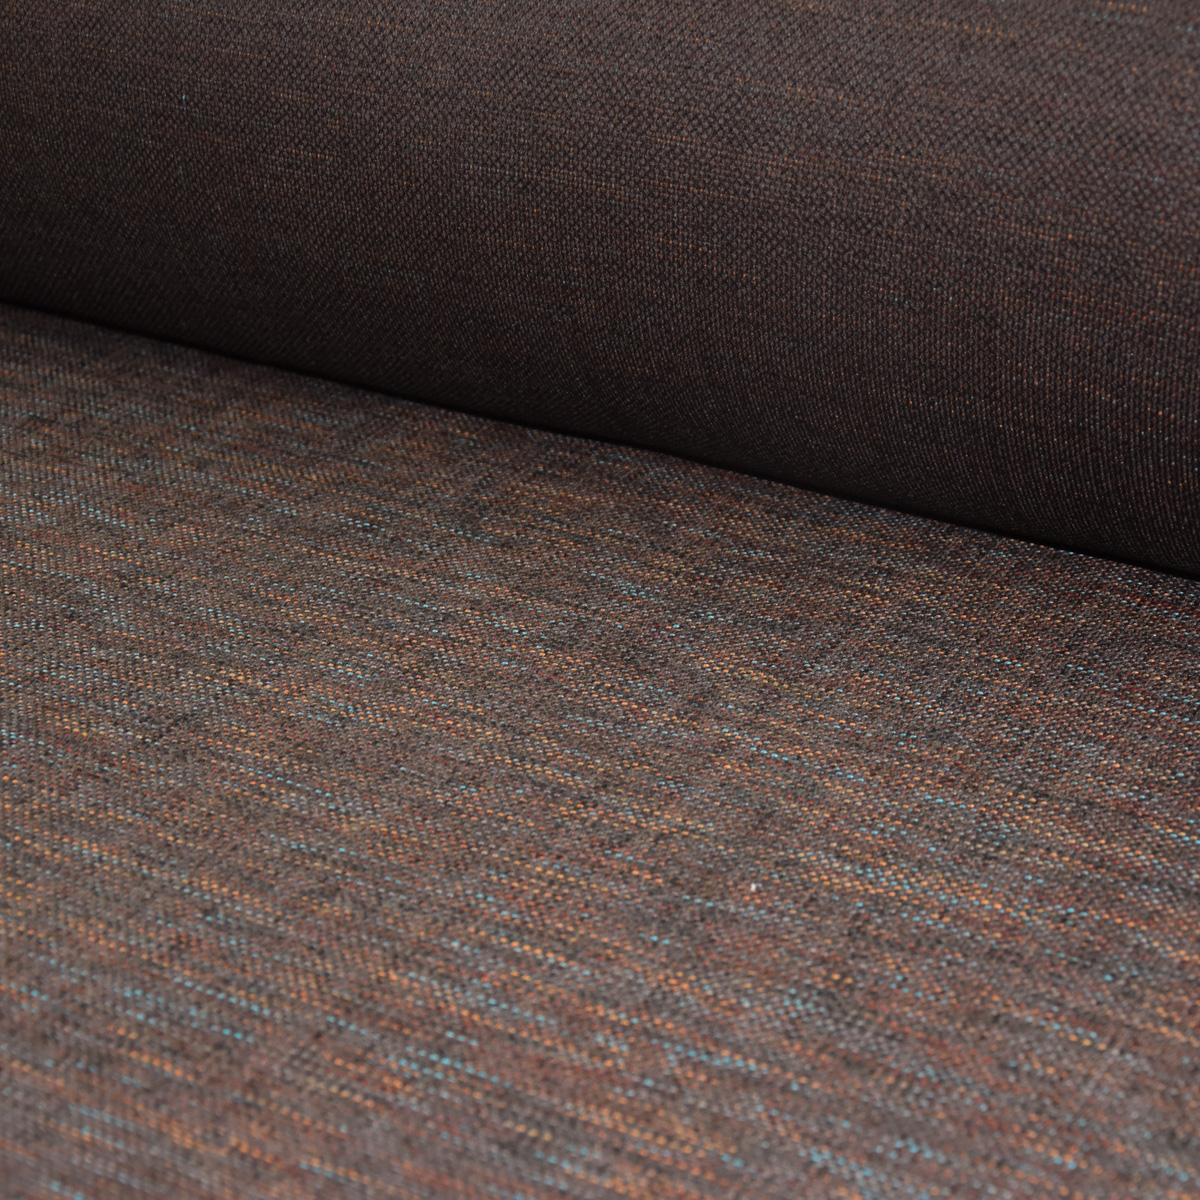 bezugsstoff m belstoff miranda braun orange t rkis alle stoffe wohnstoffe m belstoffe. Black Bedroom Furniture Sets. Home Design Ideas